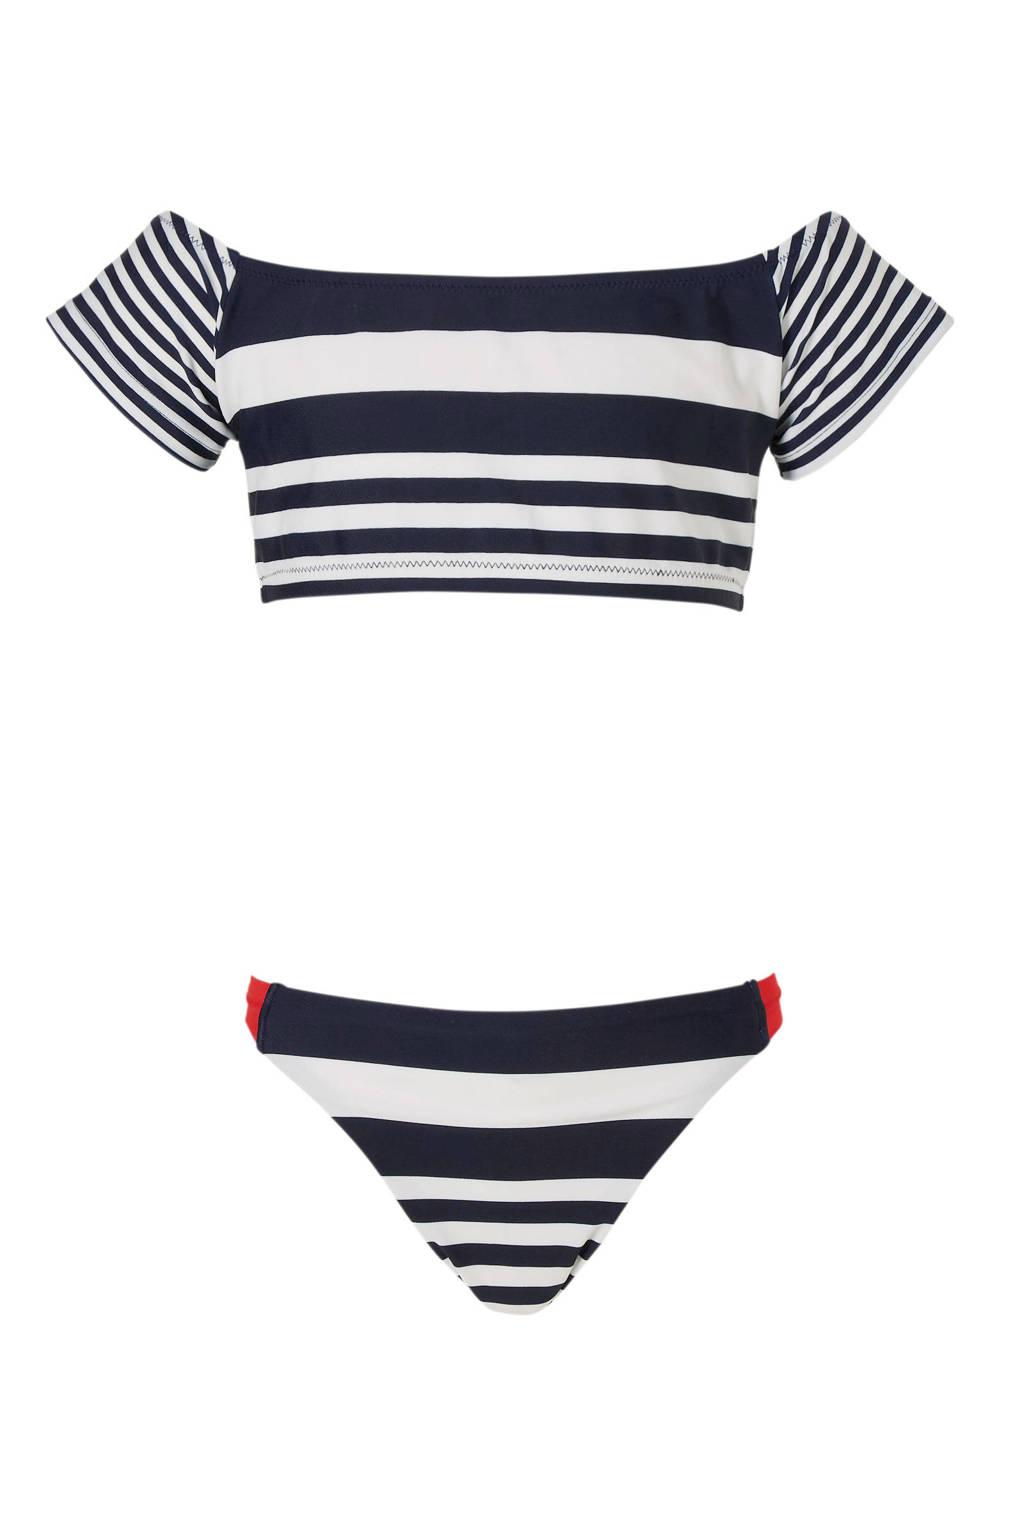 whkmp's beachwave bikini met strepen marine, Marine/wit/rood